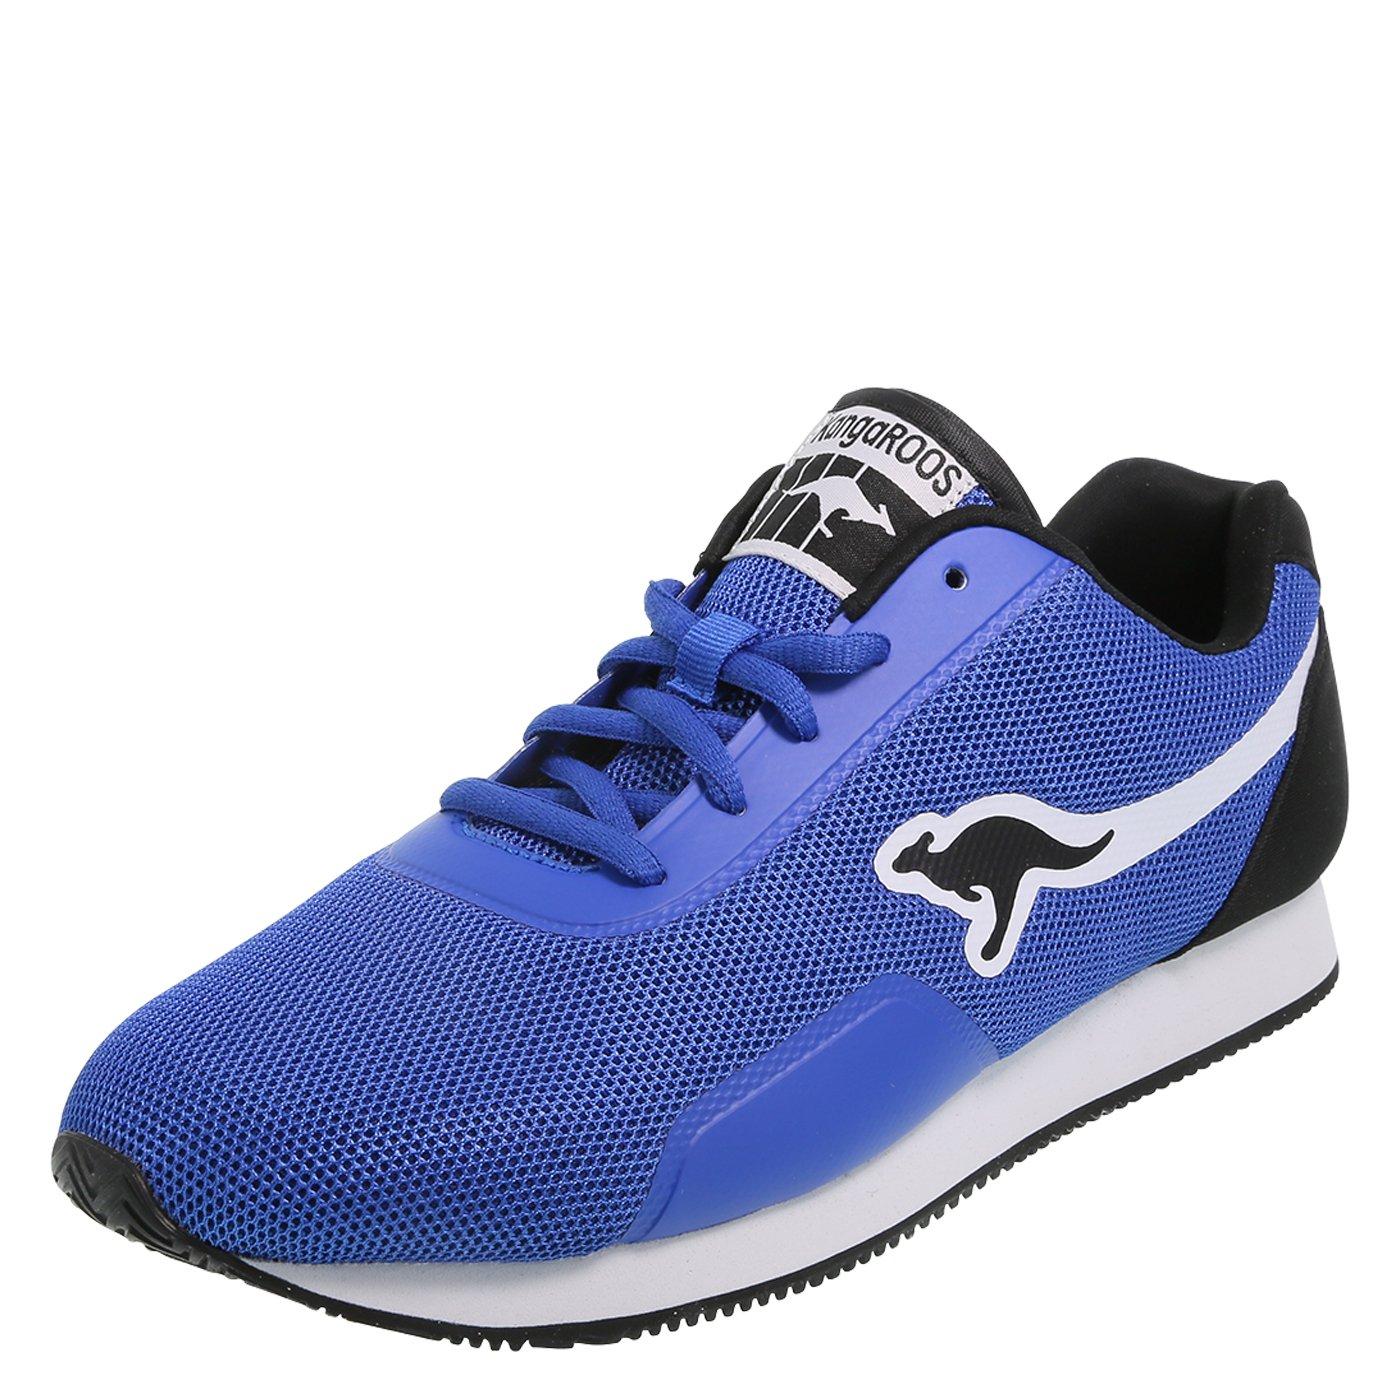 KangaROOS Men's Shadow Jogger B07DPW5B95 6 D(M) US Blue